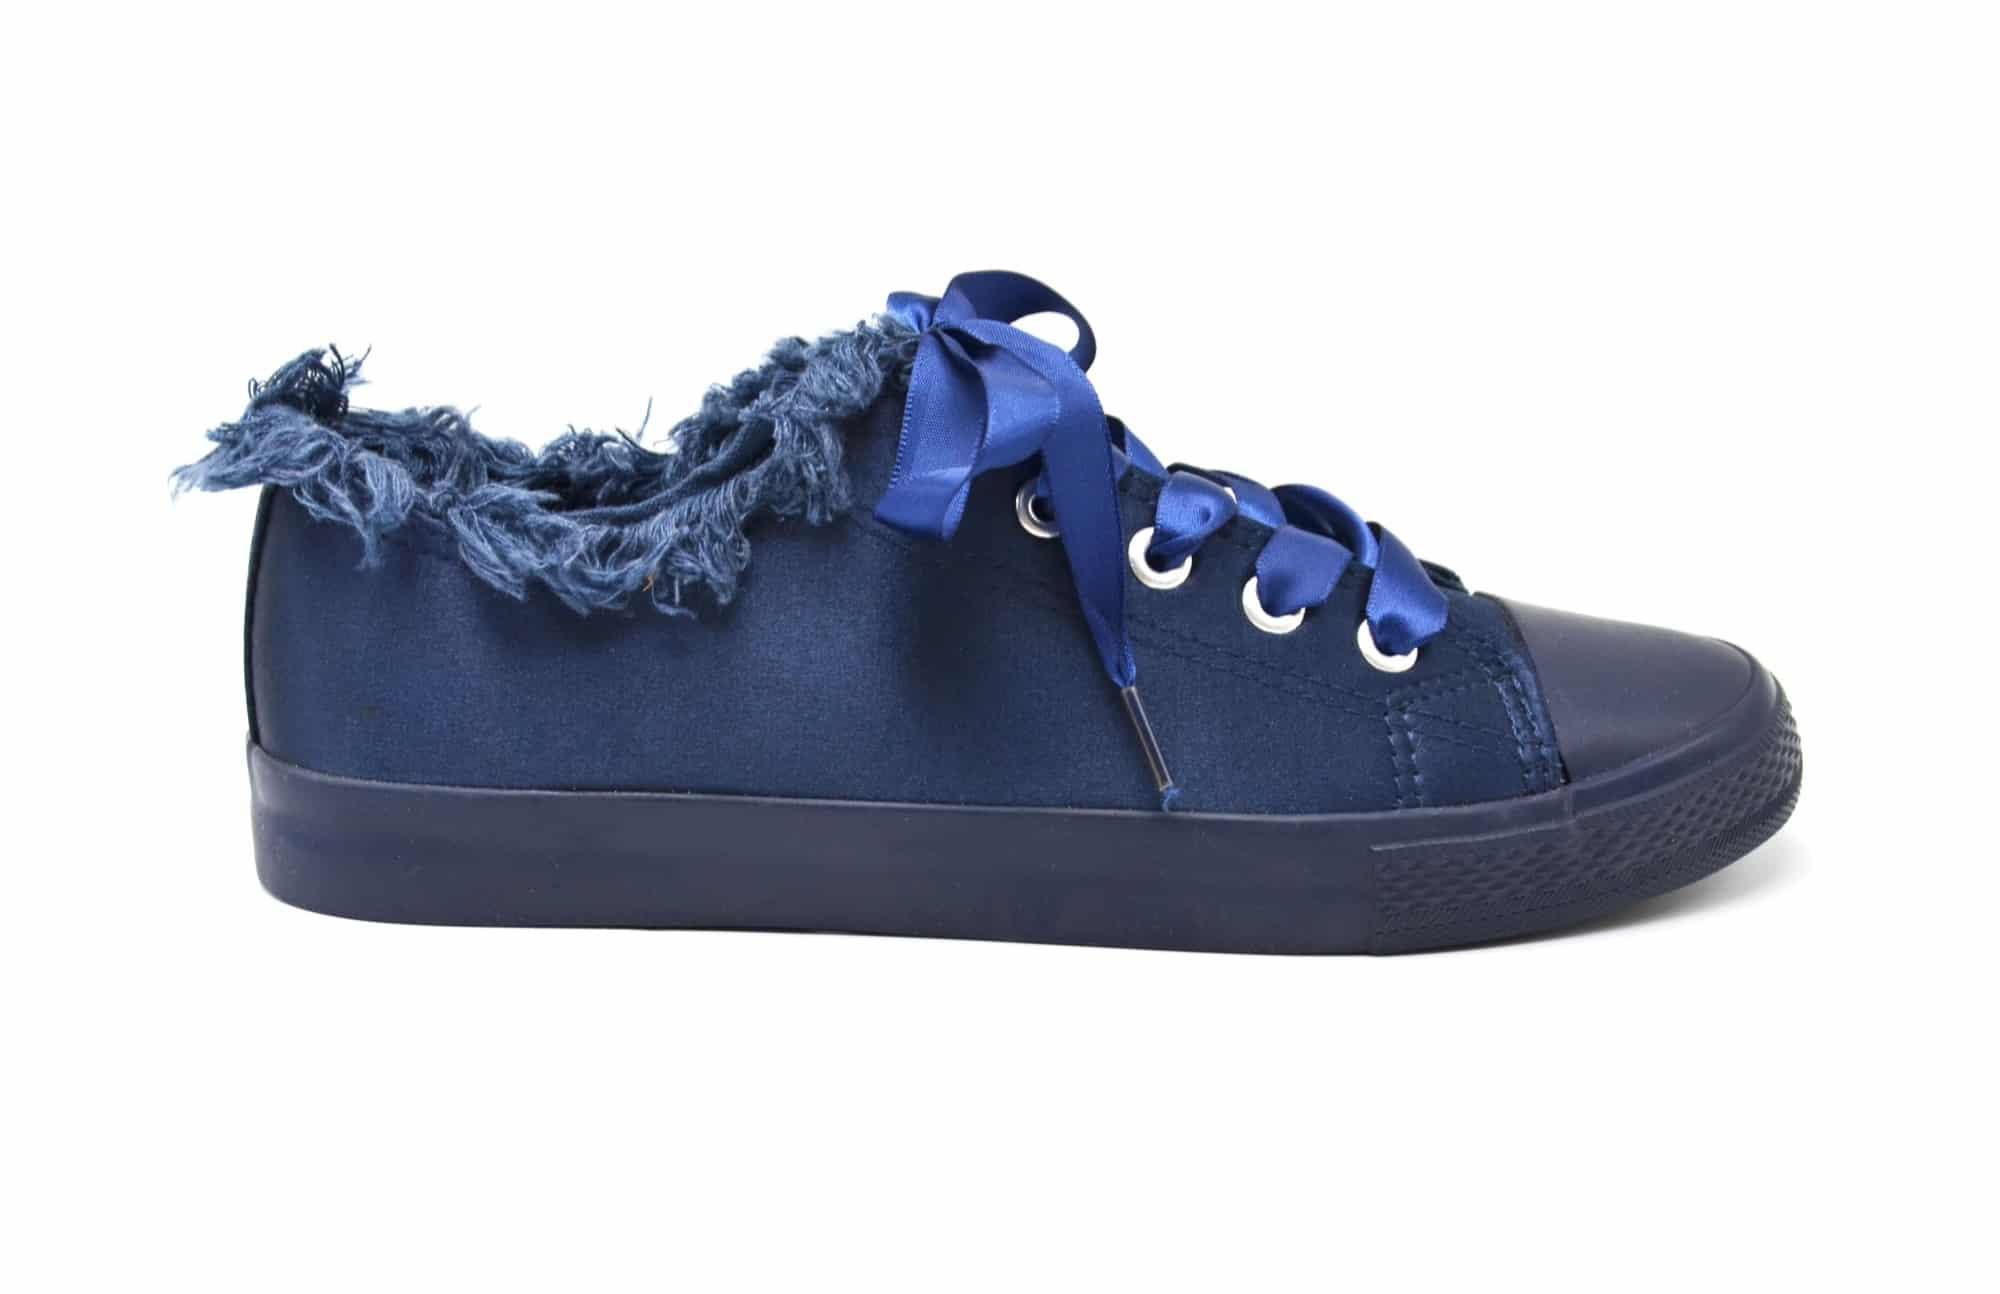 abd58dc5ce7a6 SHY58   Baskets Tennis Sneakers Tissu Satiné Bleu Marine avec Bord ...